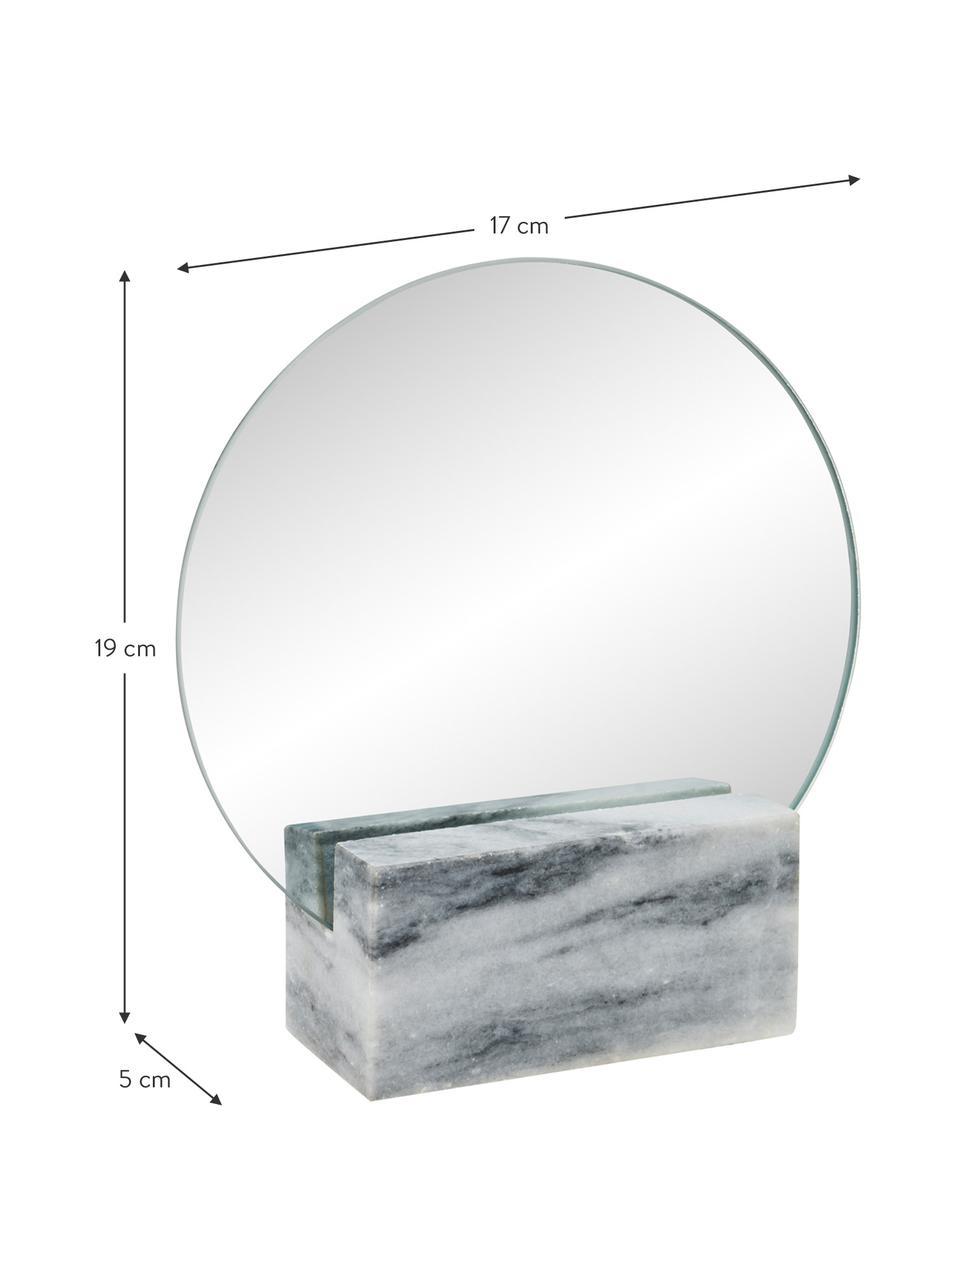 Marmor-Kosmetikspiegel Humana, Spiegelfläche: Spiegelglas, Fuß: Marmor, Grau, 17 x 19 cm